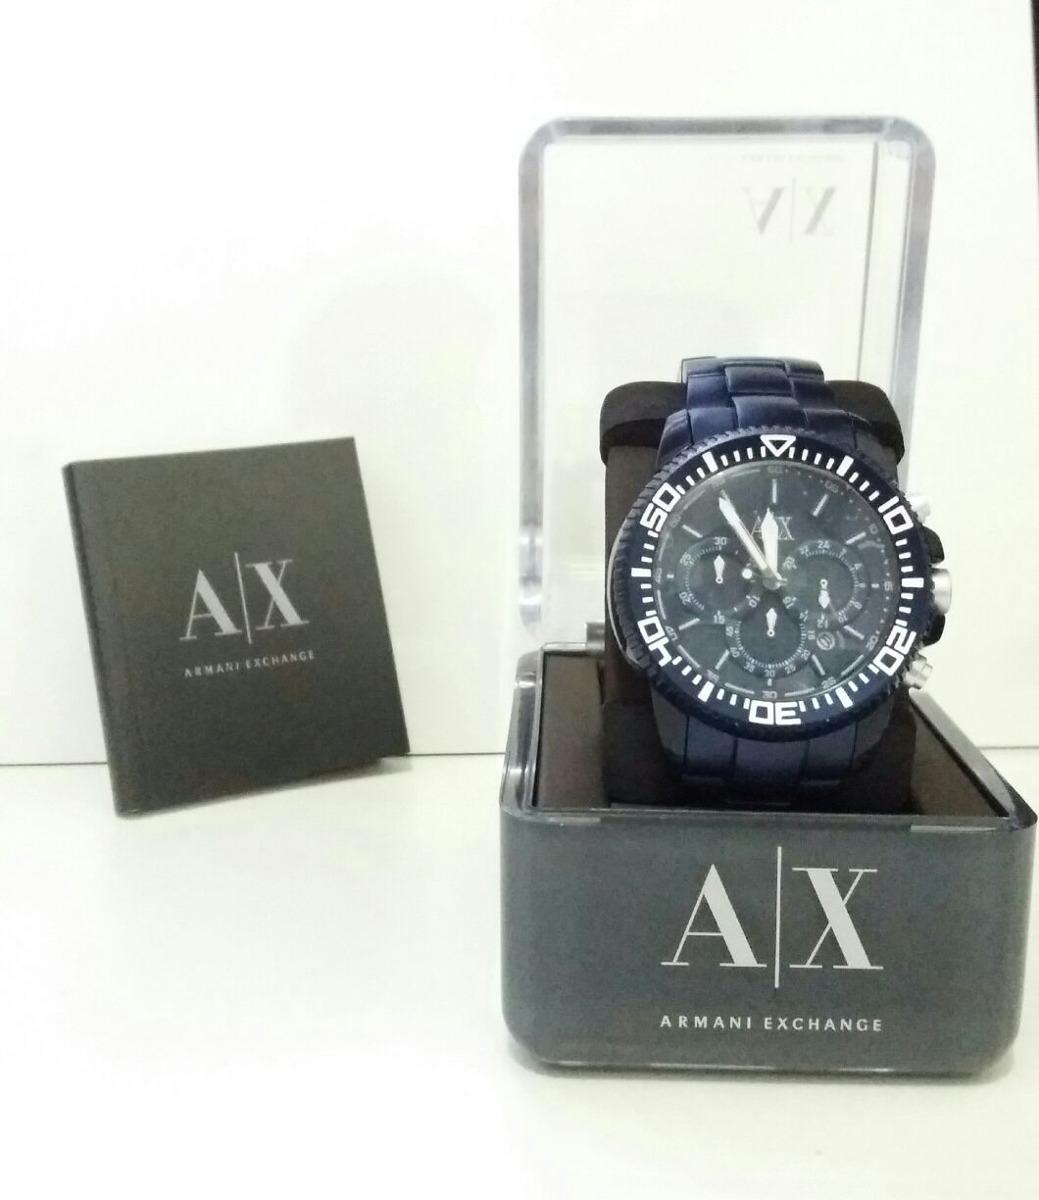 dafd2dbb97a relógio armani exchange - modelo ax1209 - produto original. Carregando zoom.